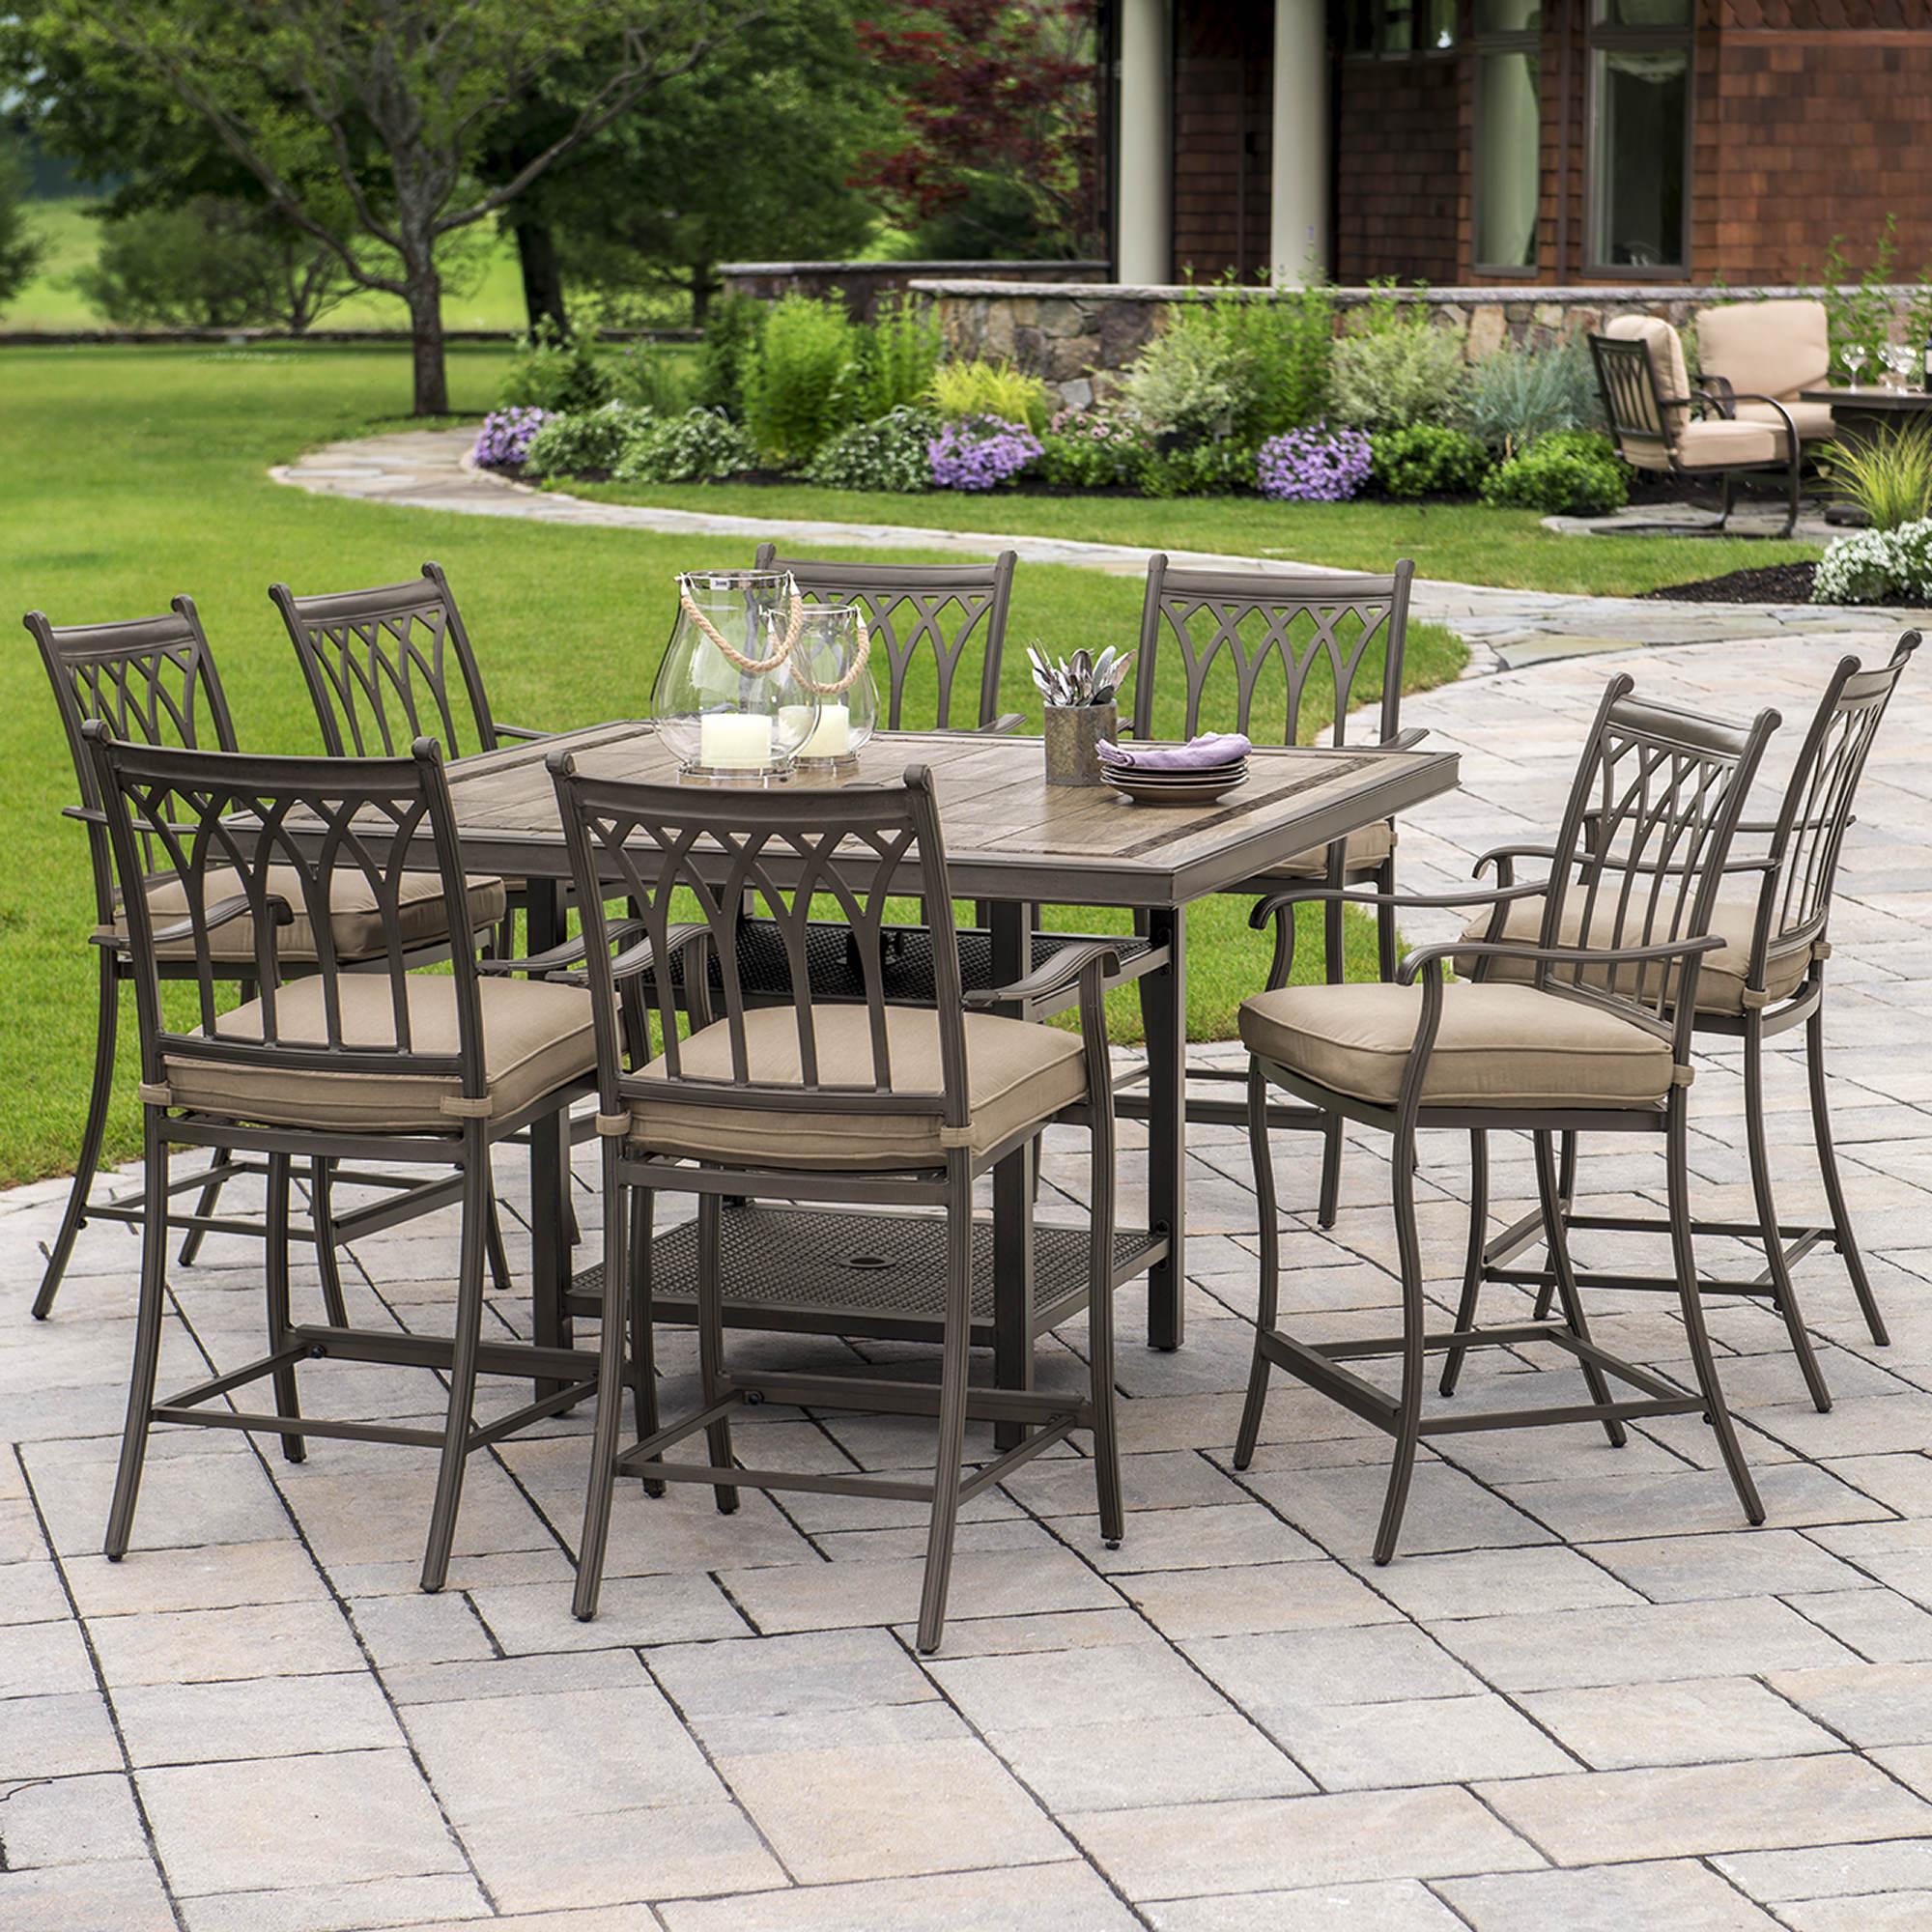 Berkley Jensen Rockport 9 Pc High Top Tile Dining Set